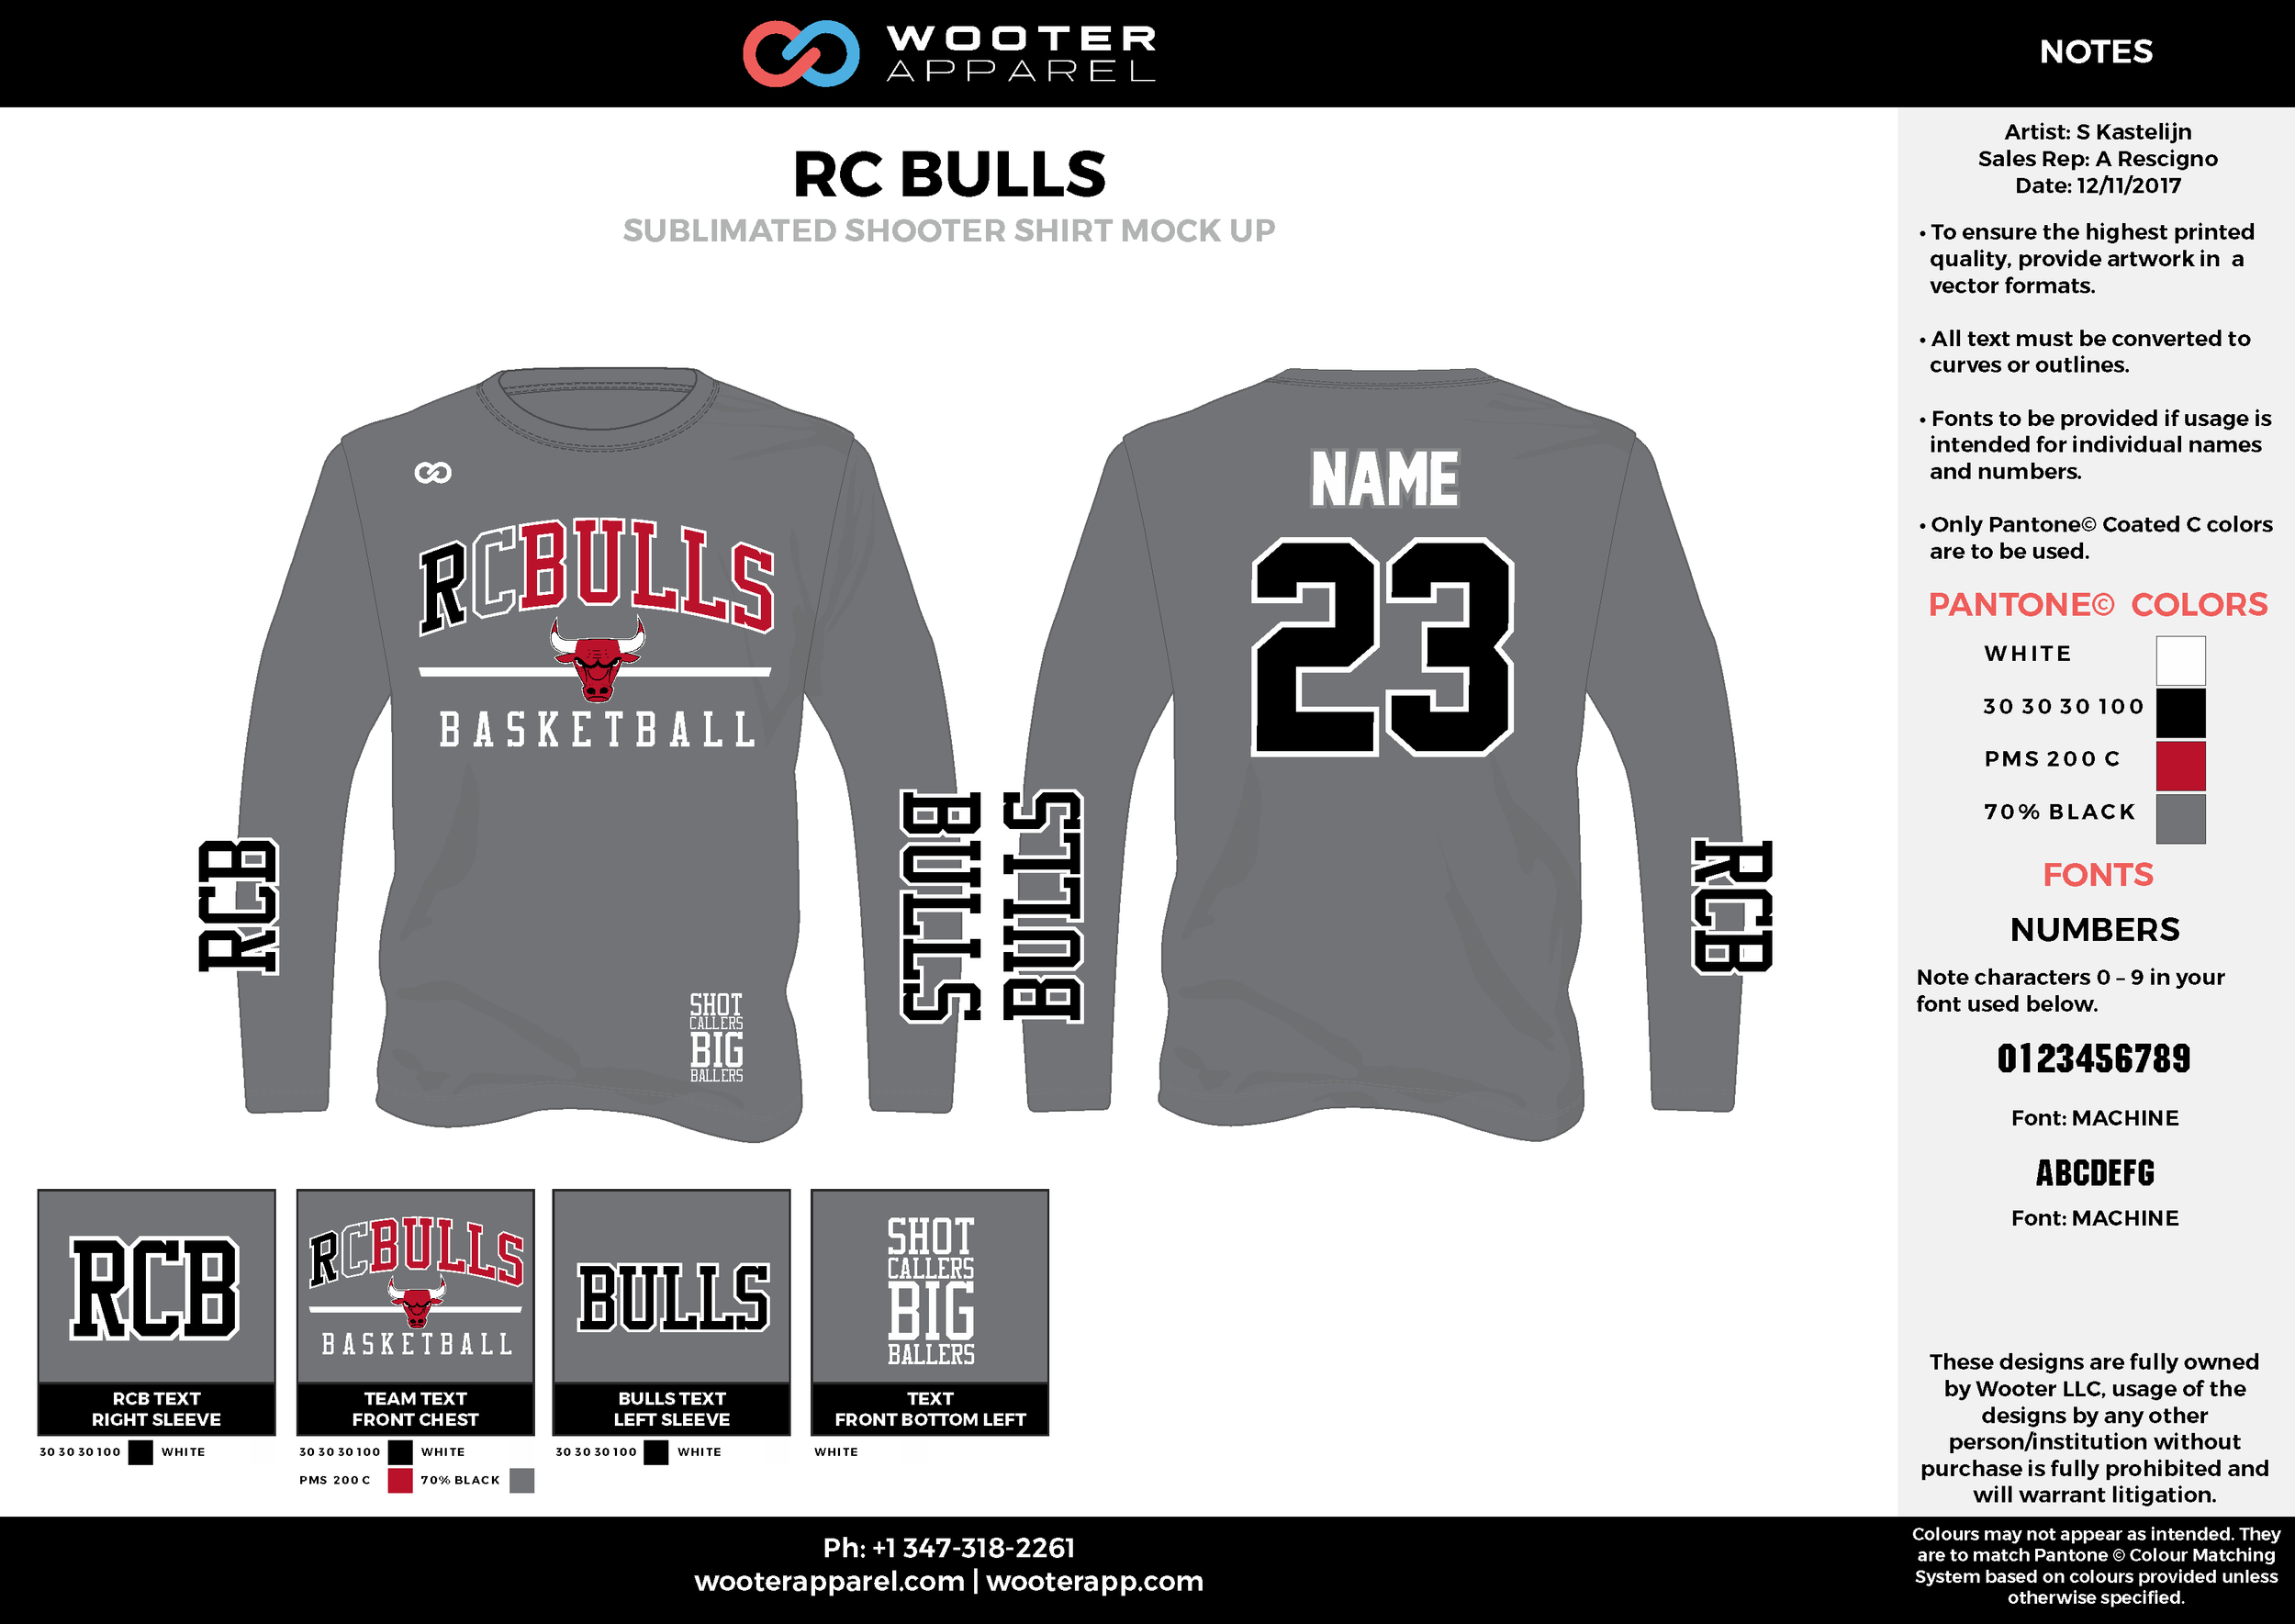 RC BULLS cool gray white red black custom design t-shirts